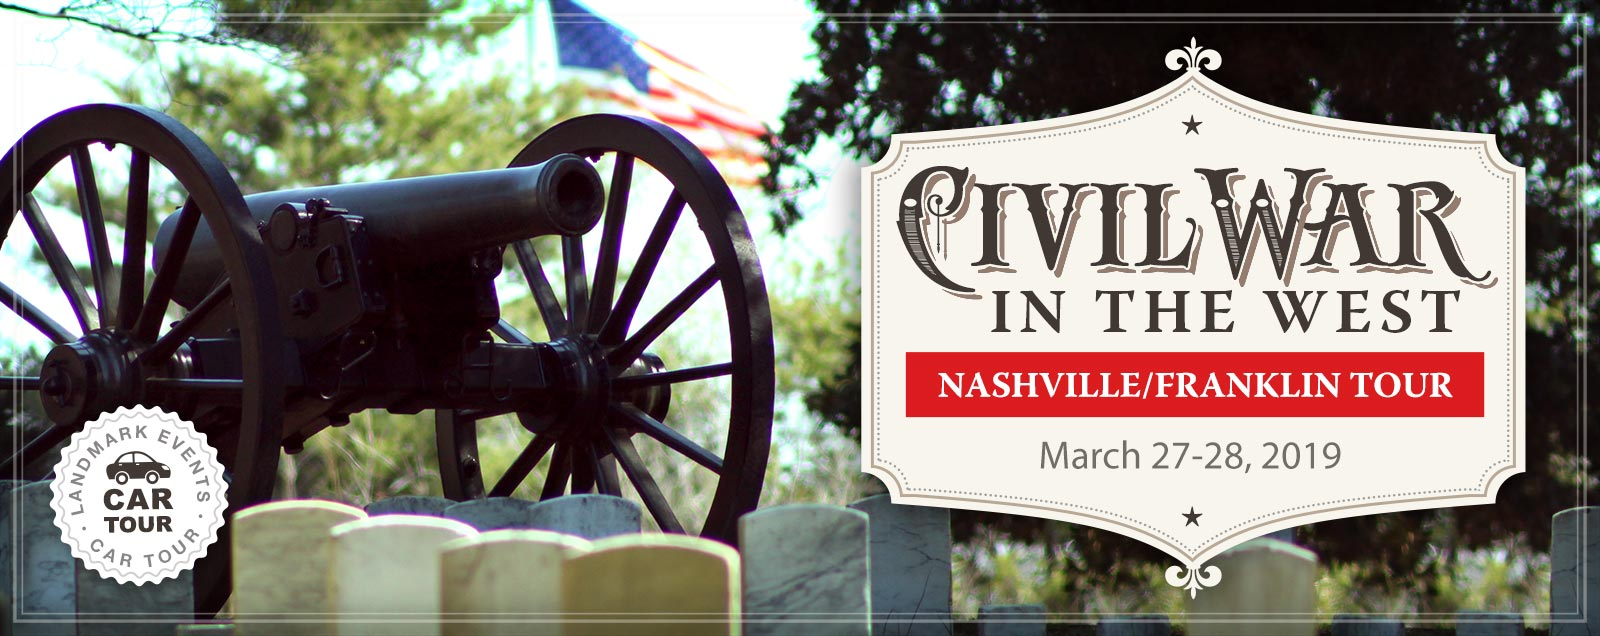 Civil War in the West Tour 2019 – Landmark Events